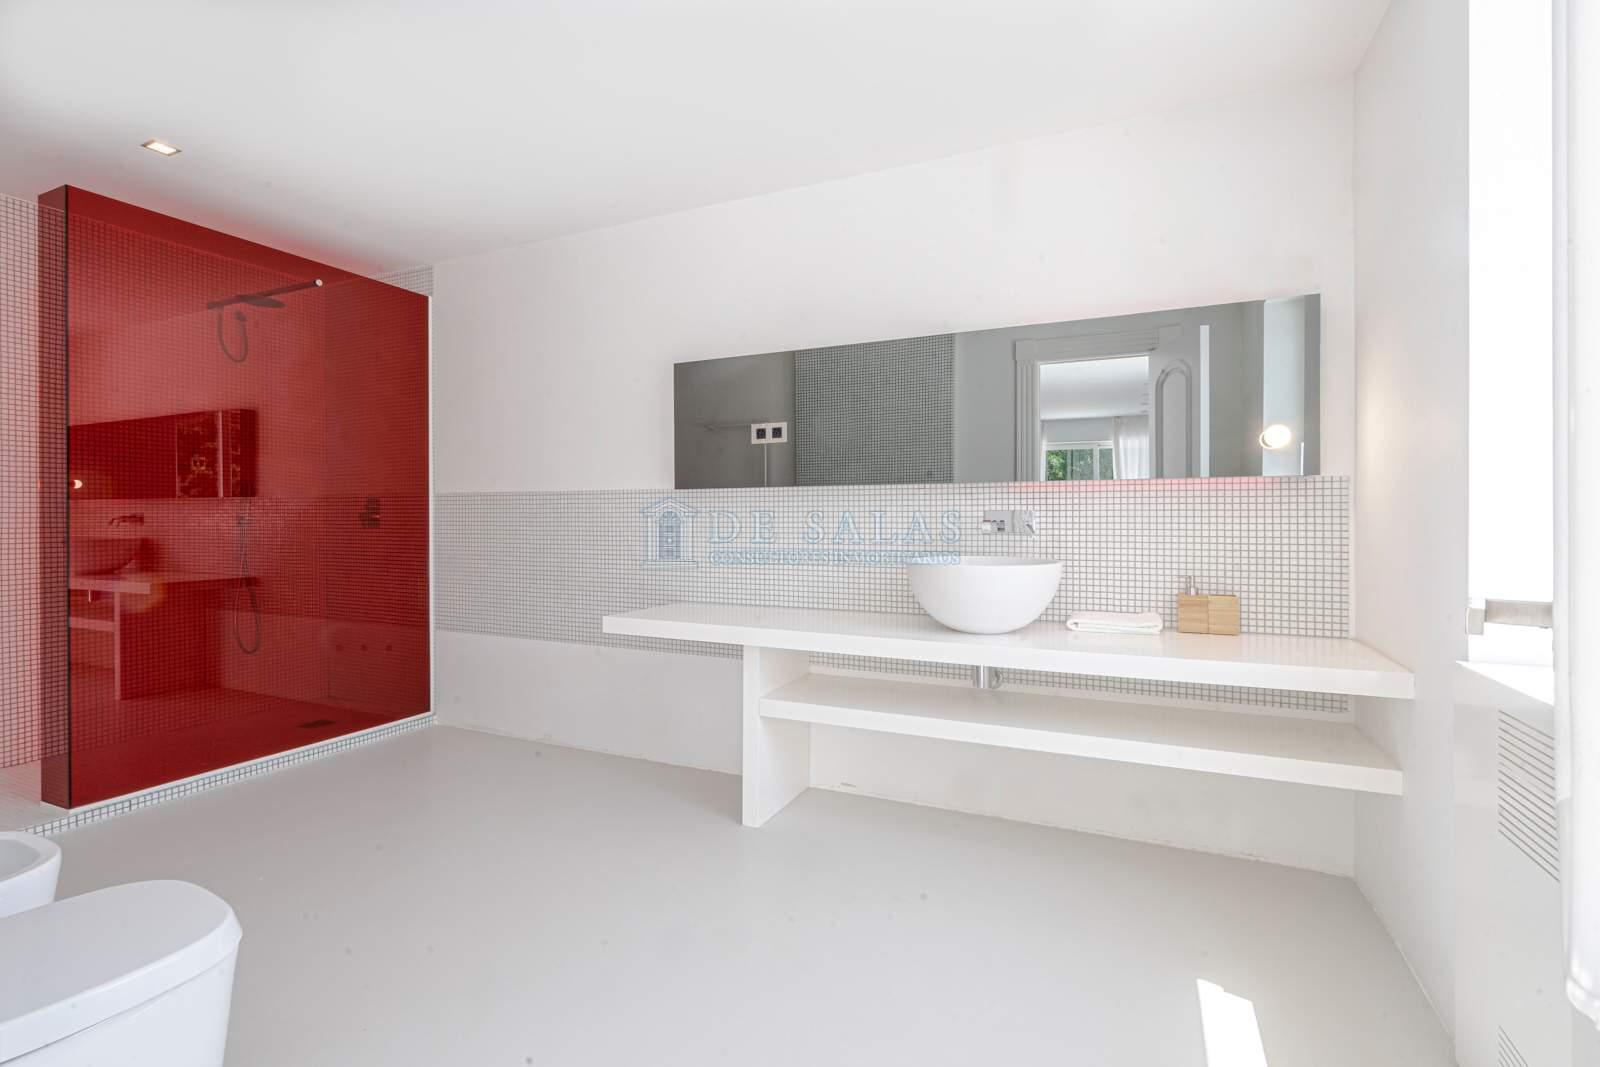 Baño-0031 House La Moraleja